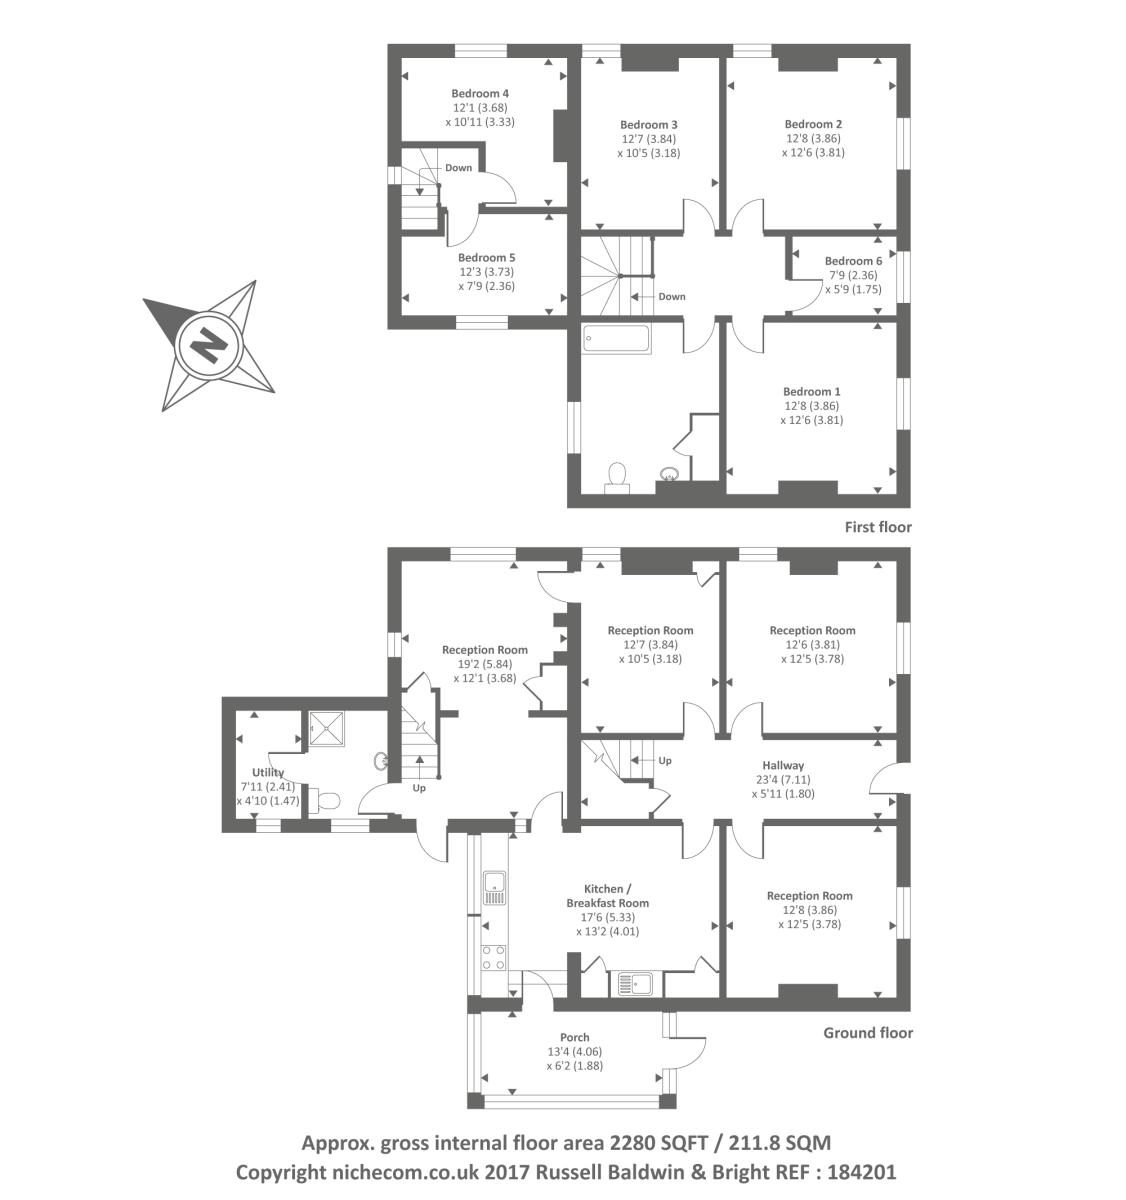 Wells Branch Apartments: 6 Bed House For Sale In AbbeyCwmHir, Llandrindod Wells,LD1